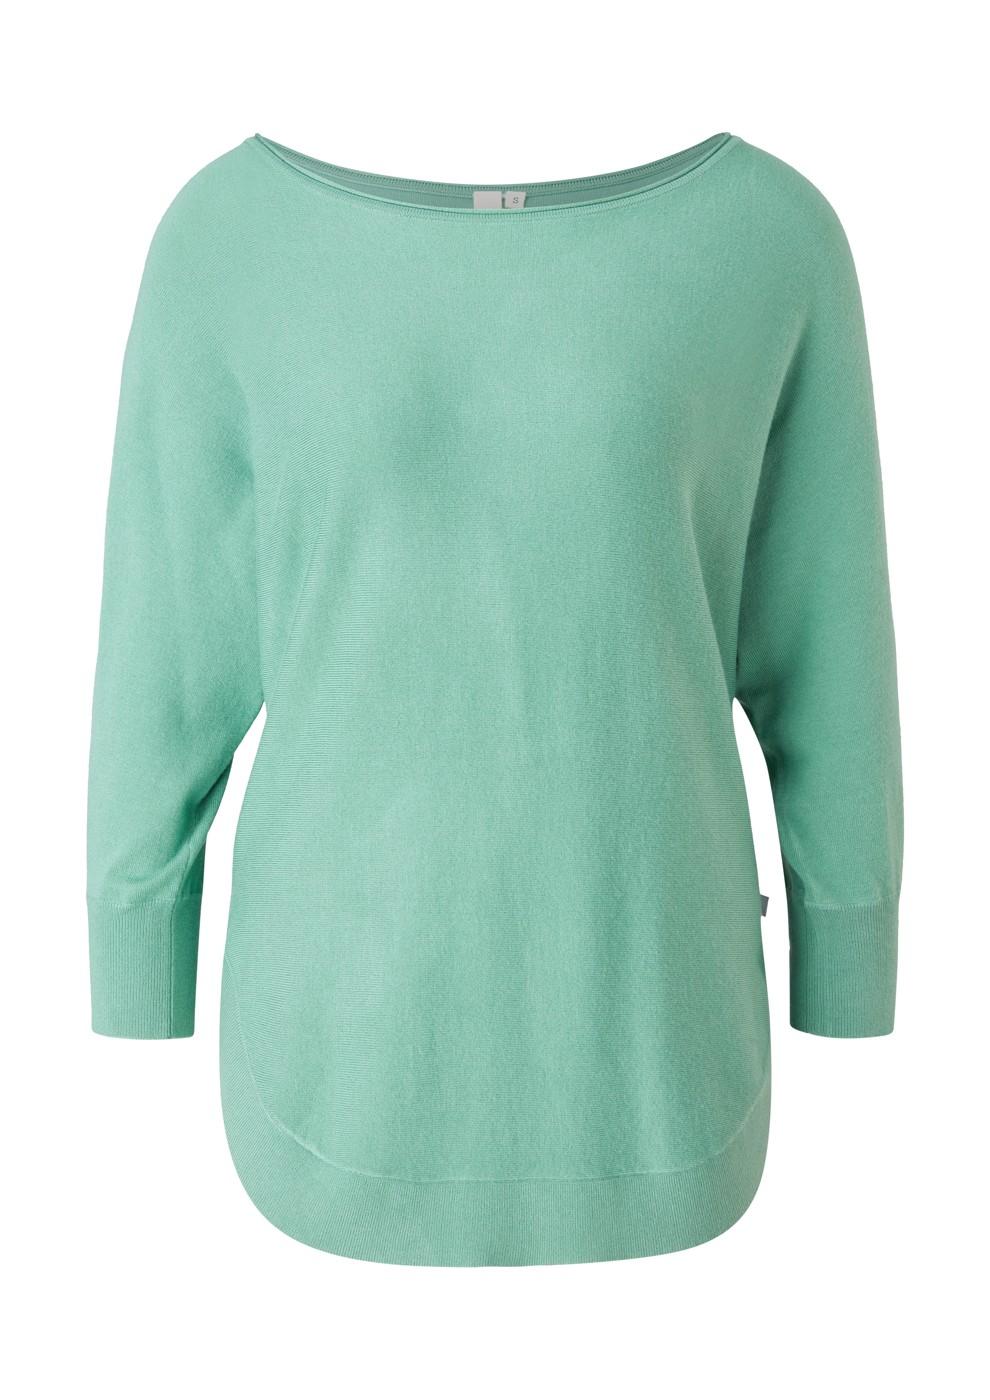 510 Pullover 3/4 Arm - Damen